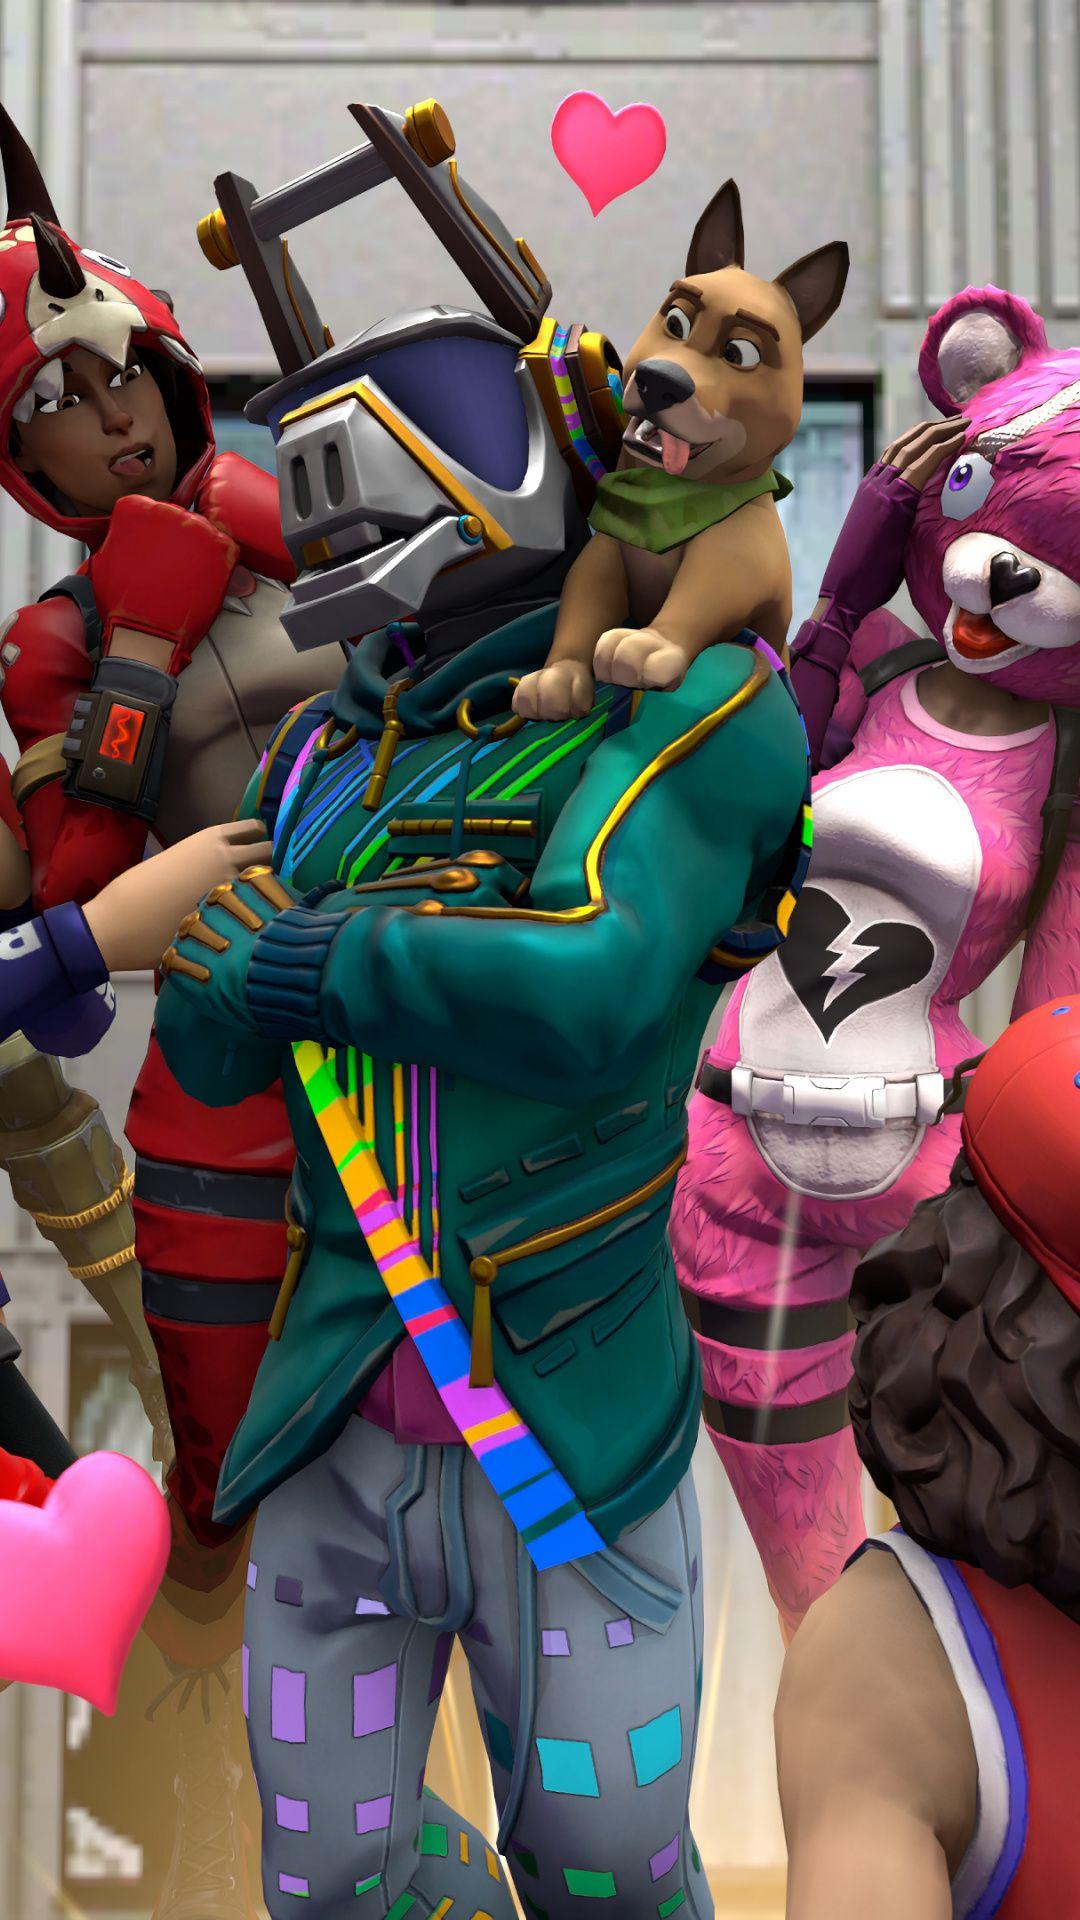 Downaload Characters Fun Party Video Game 2018 Fortnite